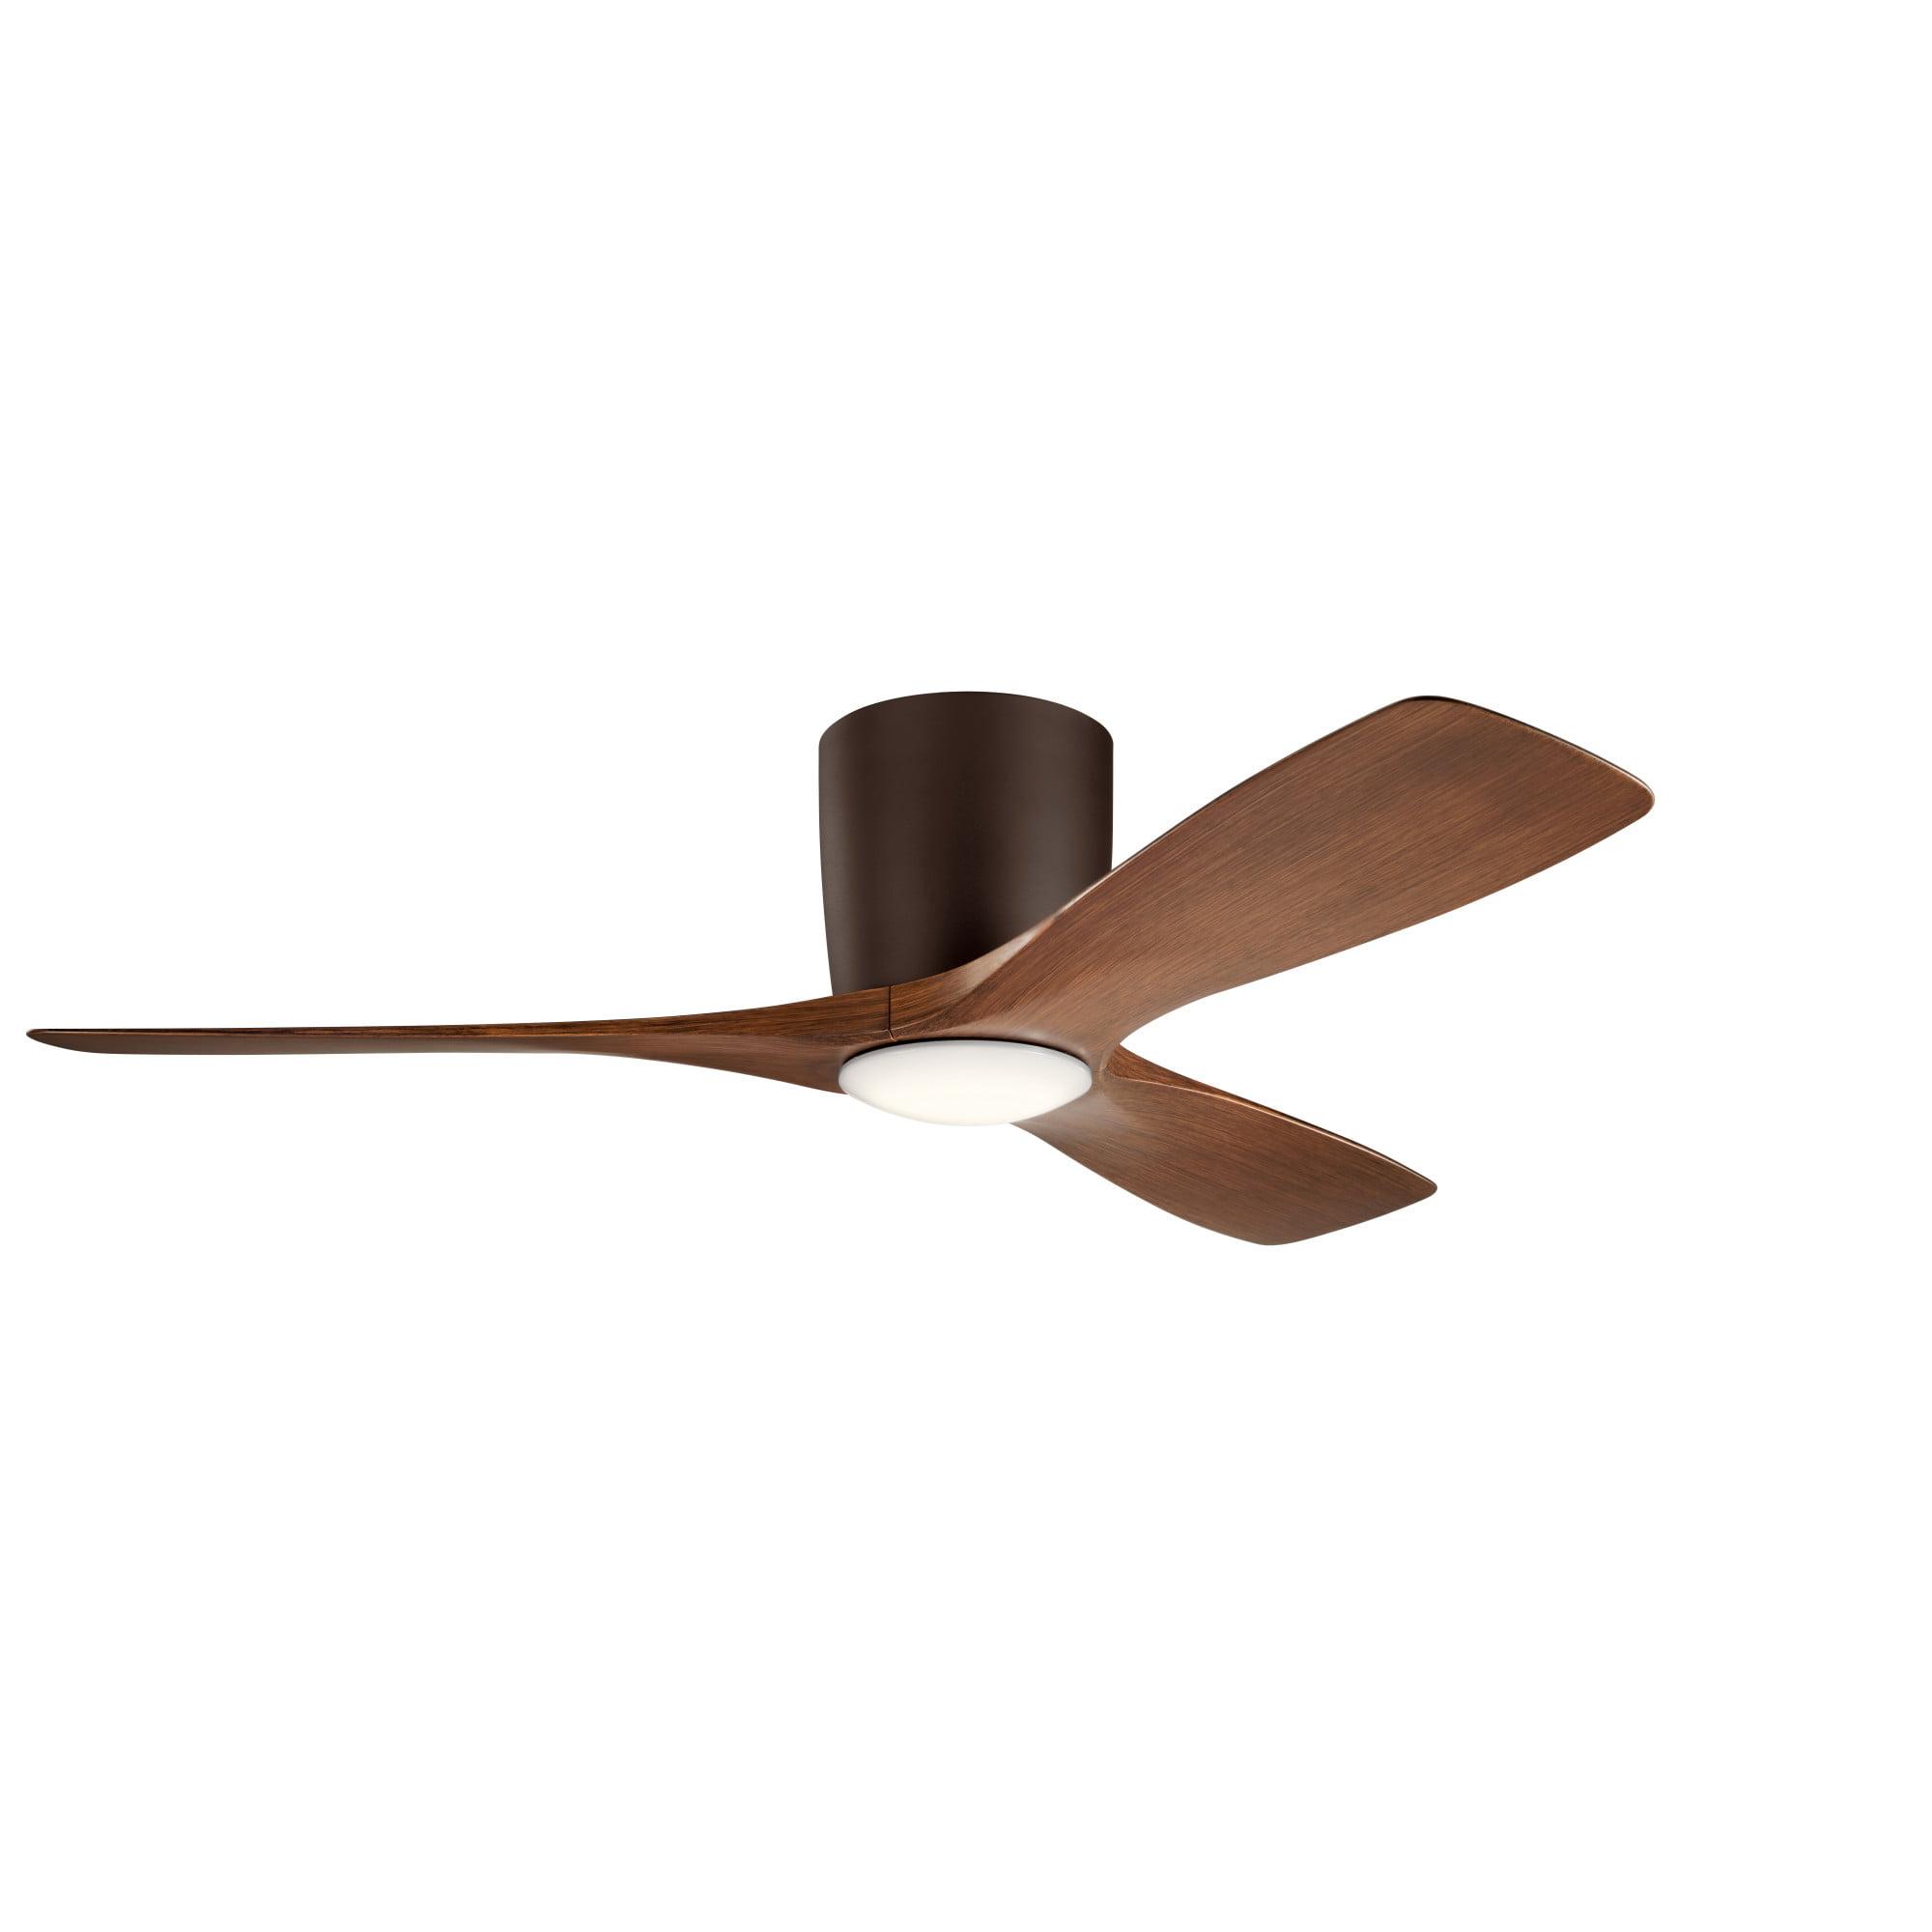 Kichler 300032 Volos 48 3 Blade Hugger Indoor Ceiling Fan Walmart Com Walmart Com